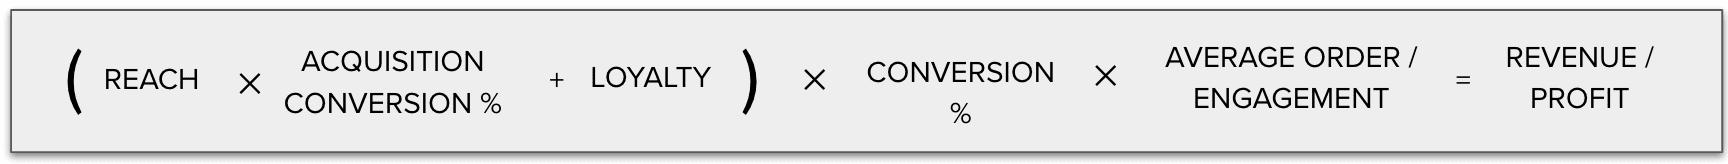 Personalization business case formula